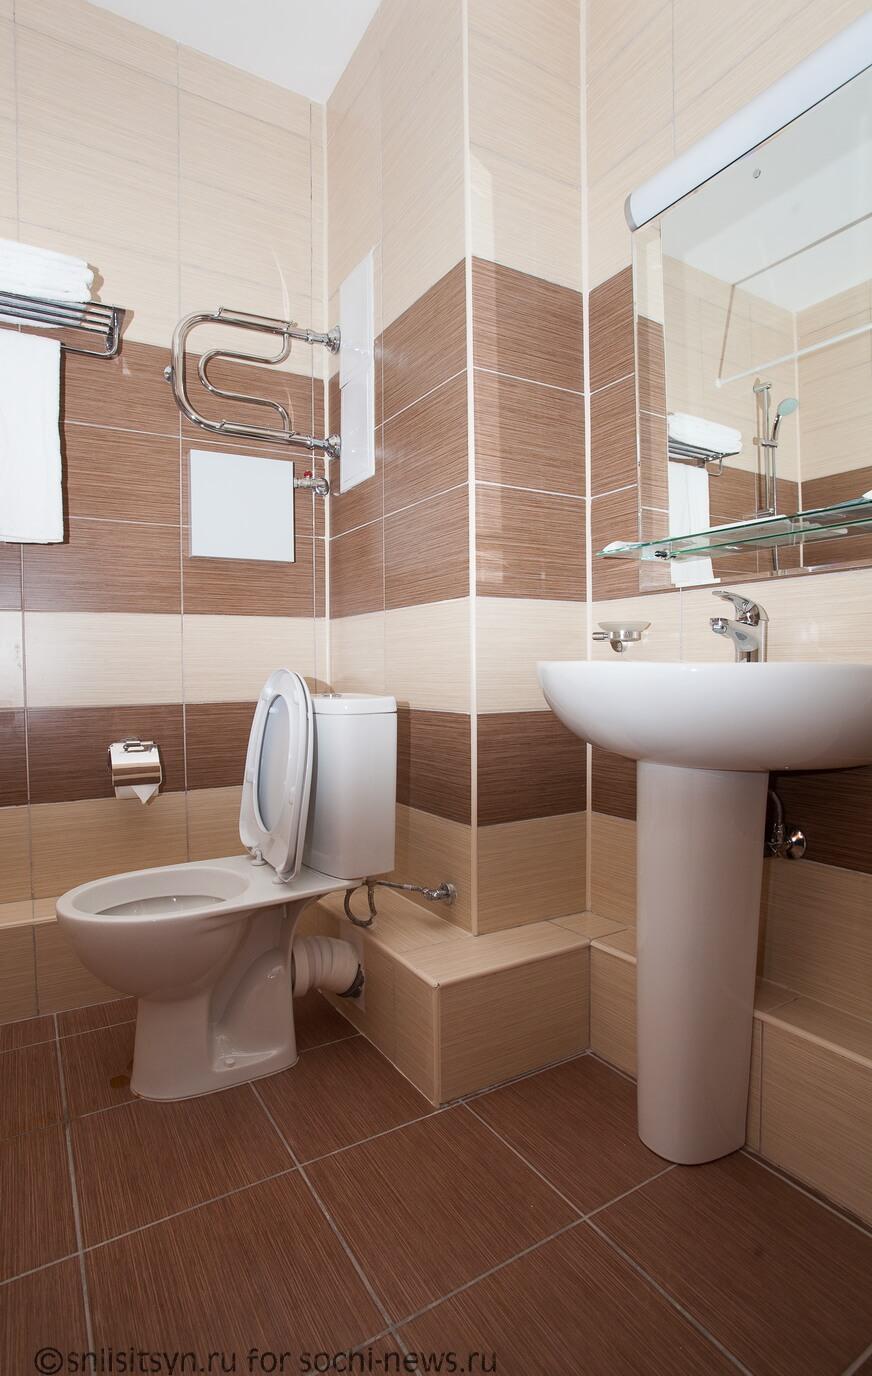 Апартаменты комфорт класса в Адлере - image bathroom6-1 on https://bizneskvartal.ru